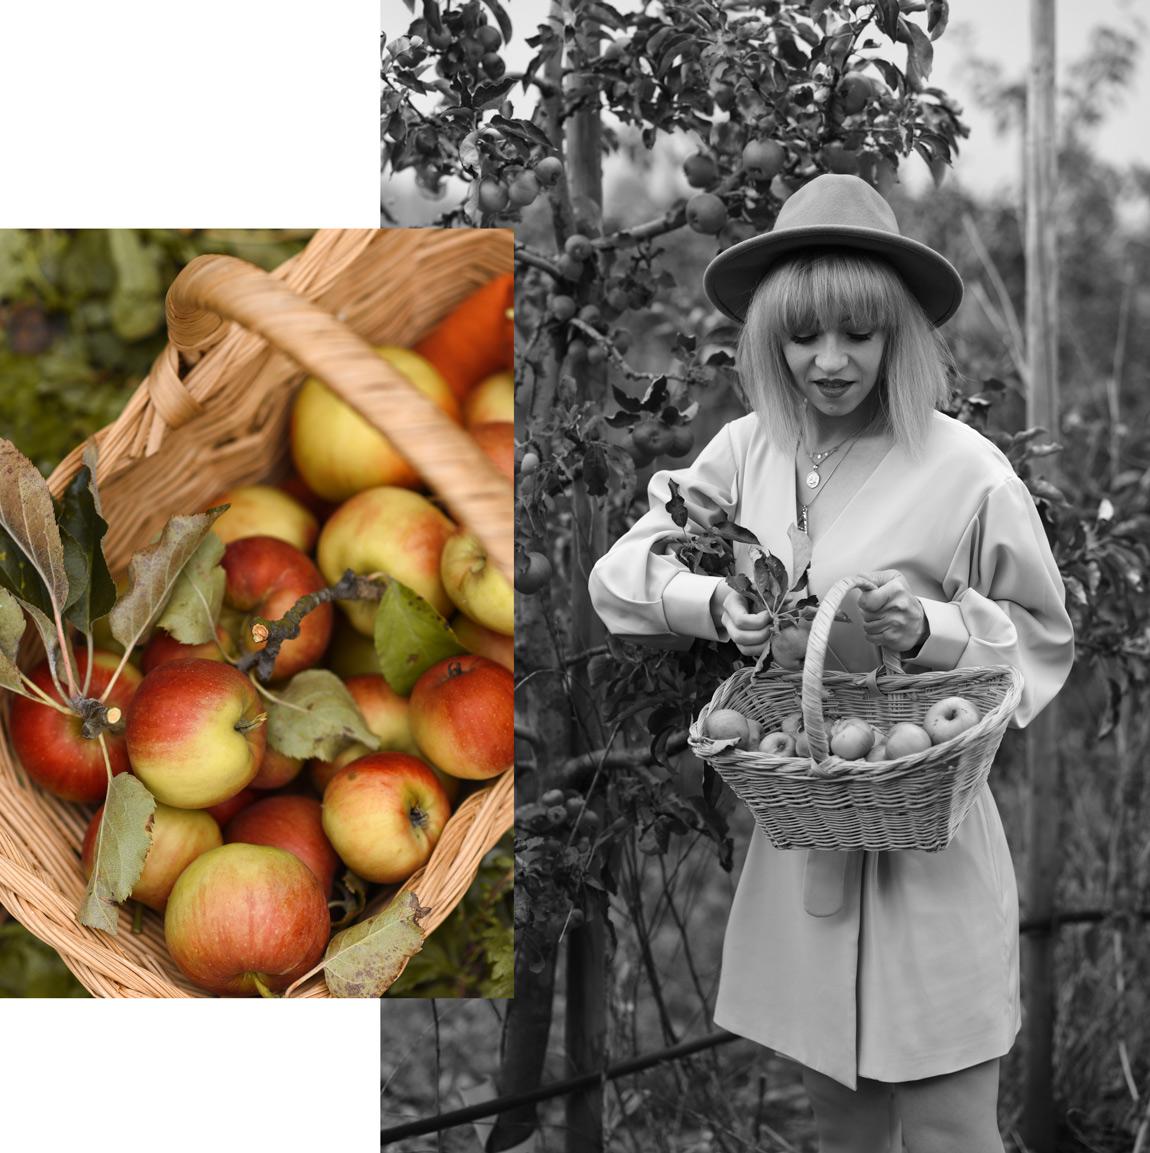 äpfel, schwäche, sünden, life, update, berlin, apfelernte, brandenburg, berlin, natur, herbst, fall, autumn, inspiration, blogger, lifestyle, blog, fashionblog, modeblog